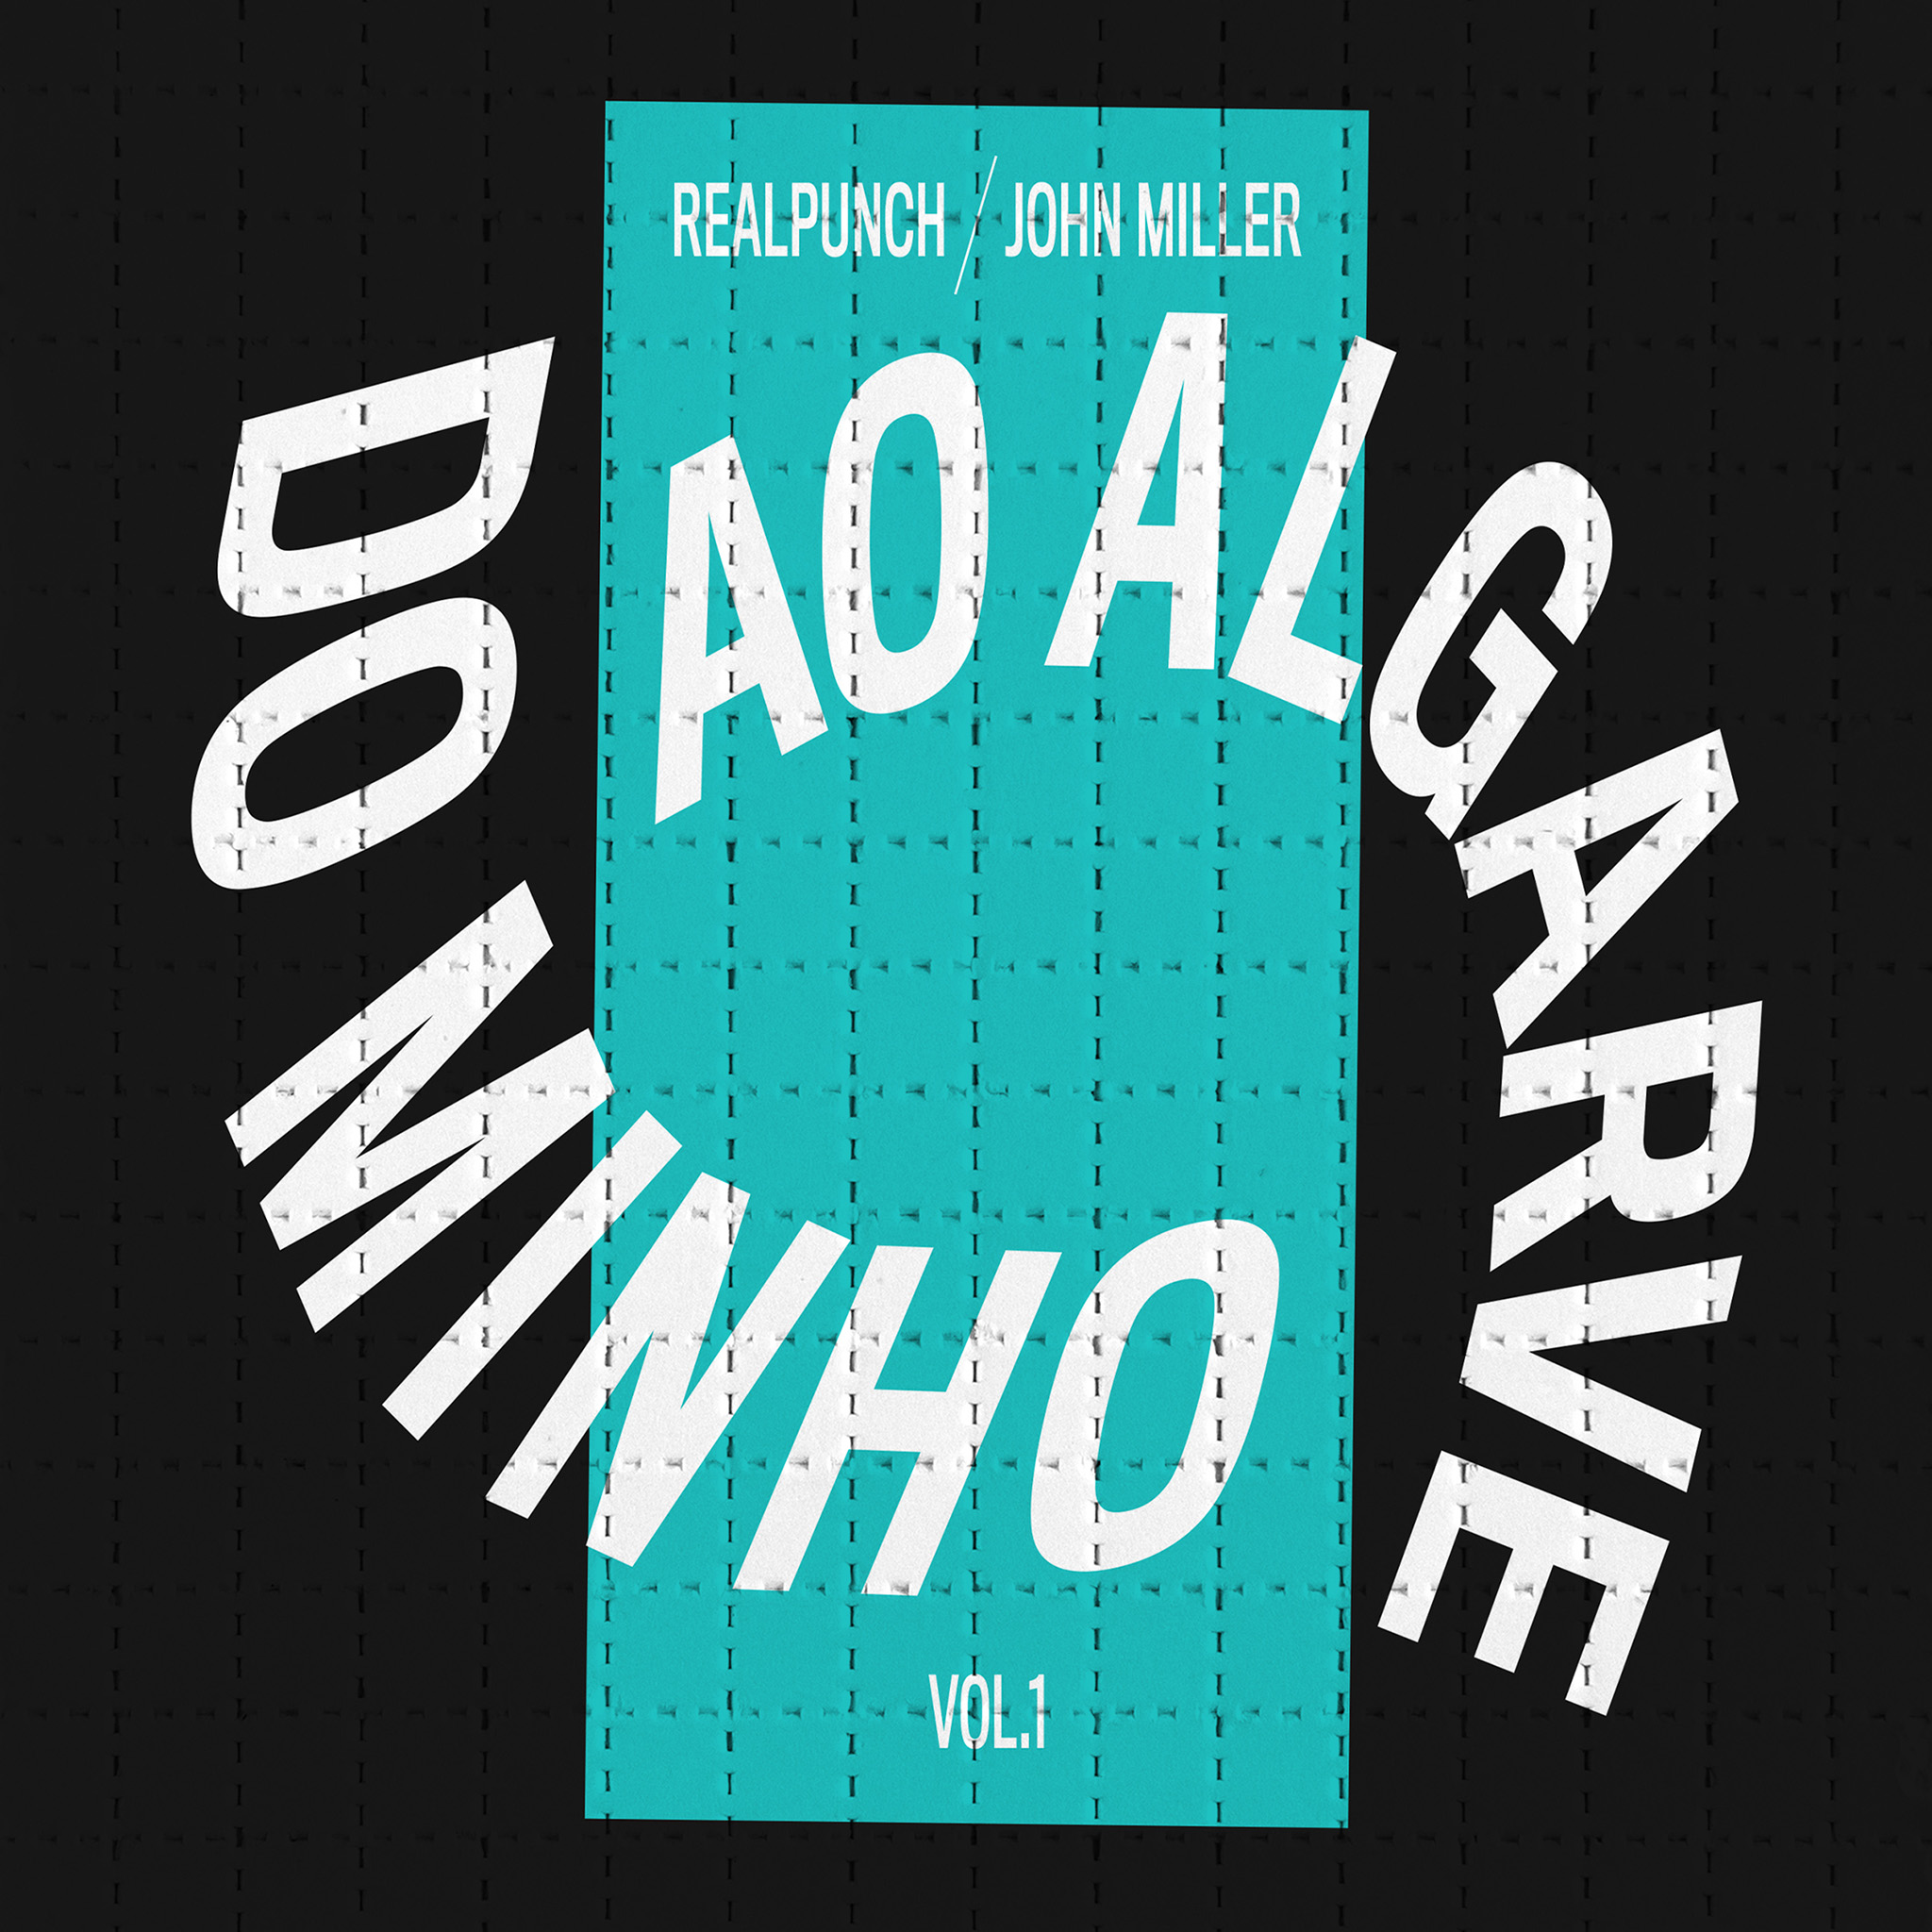 RealPunch x John Miller - Do Minho ao Algarve (Vol.1)